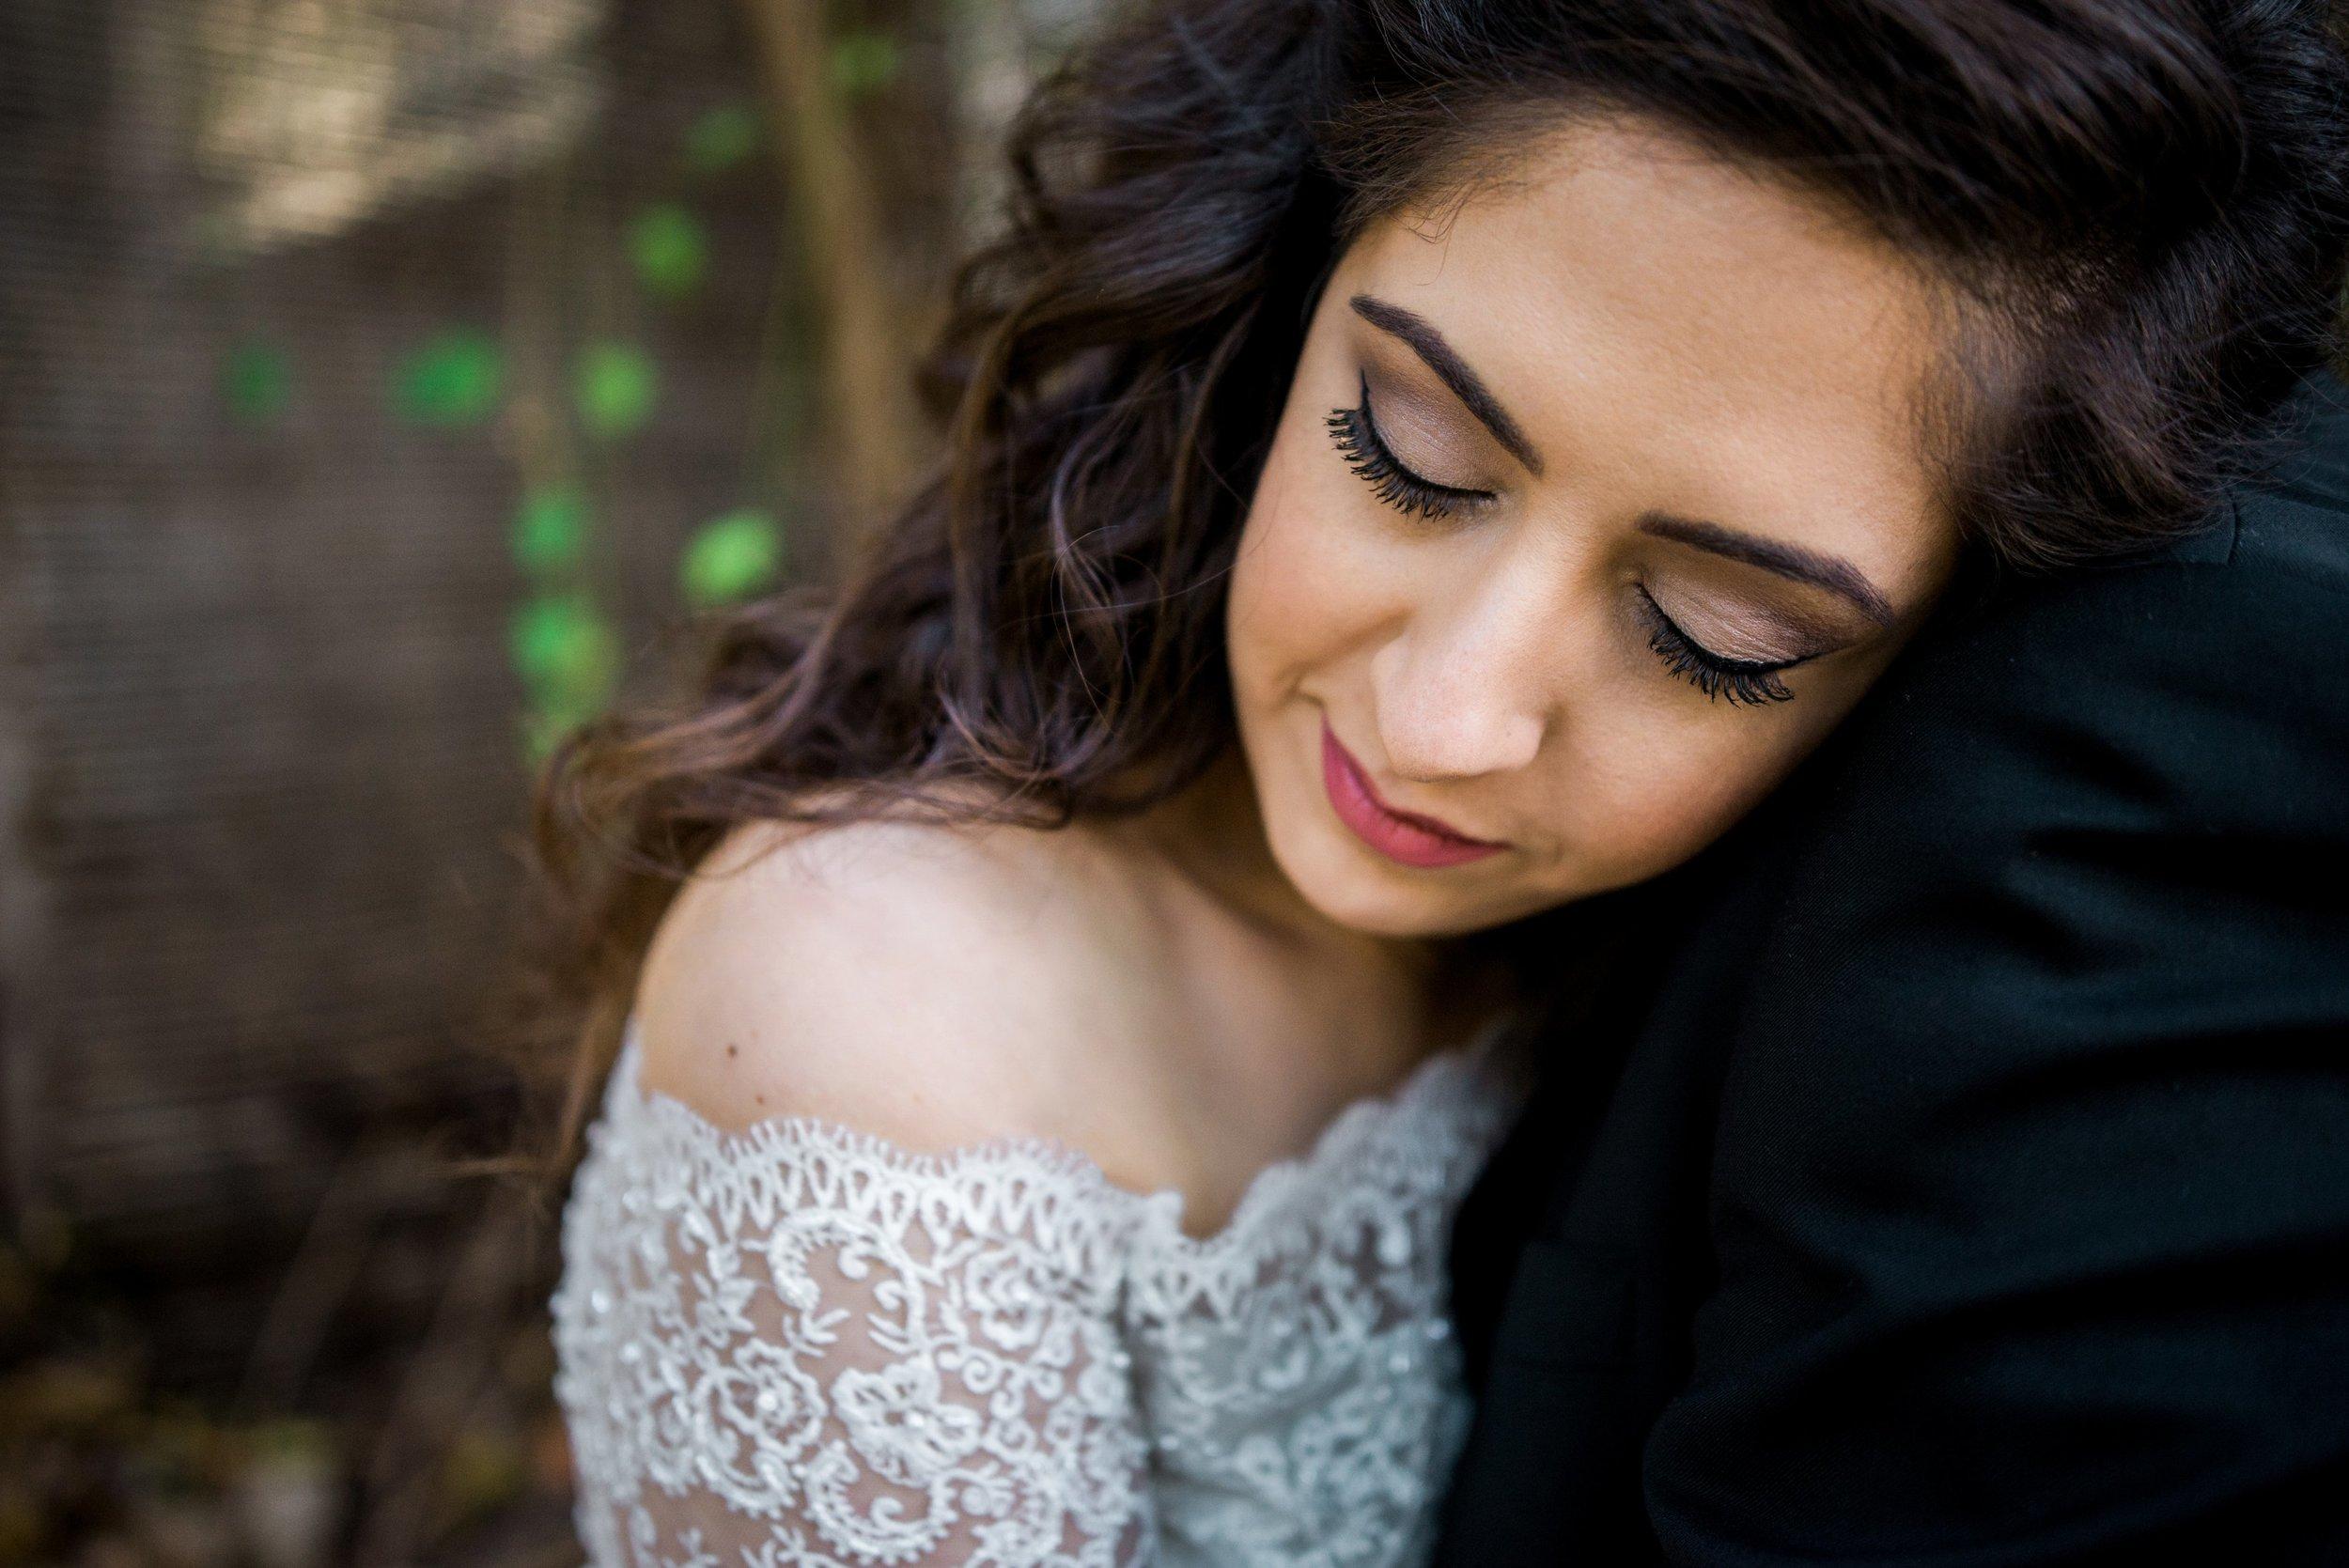 israel-garden-wedding-portraits-session-kate-giryes-photography--23_WEB.jpg